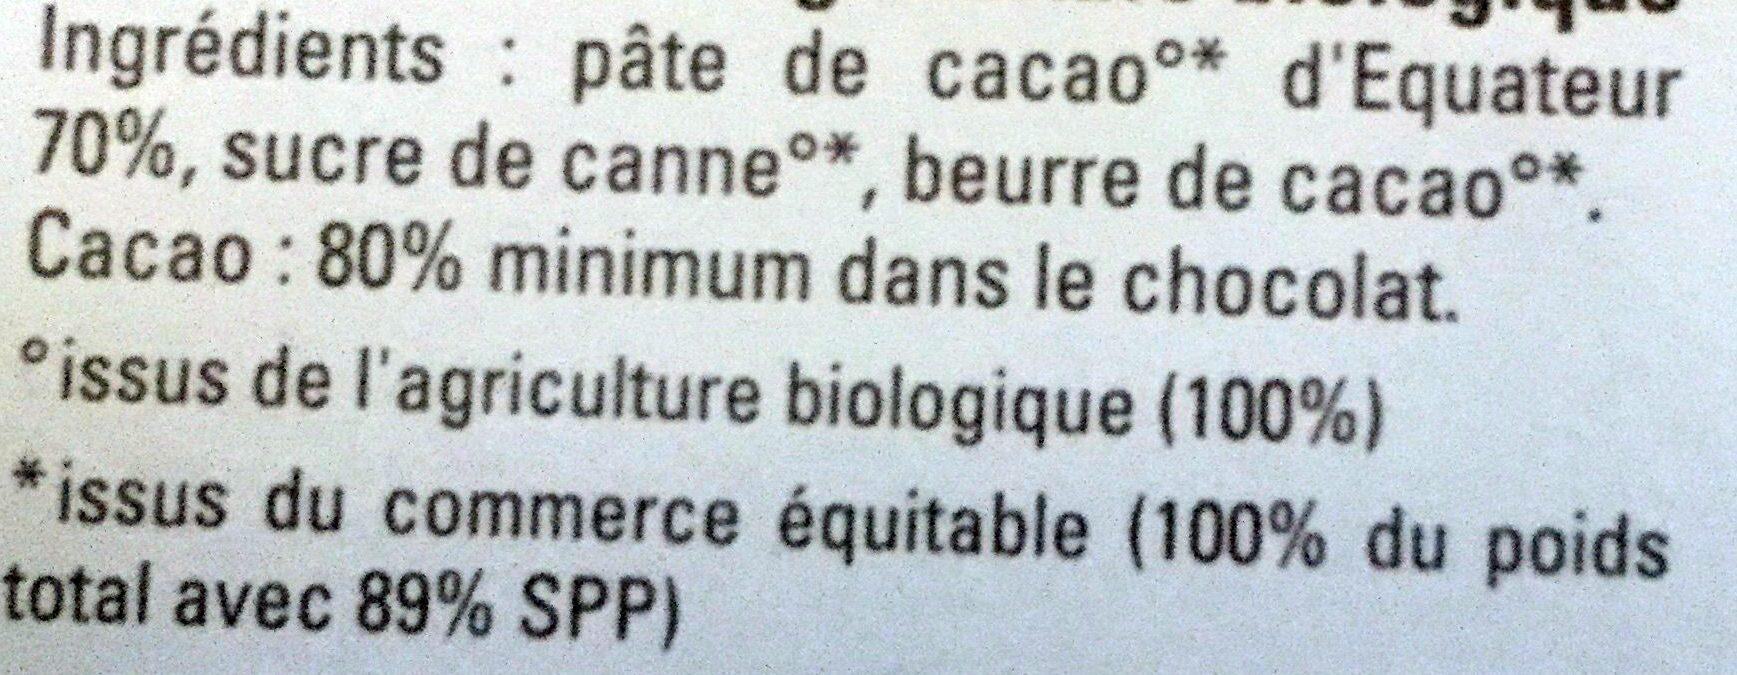 Chocolat noir 80% Equateur - Ingredients - fr